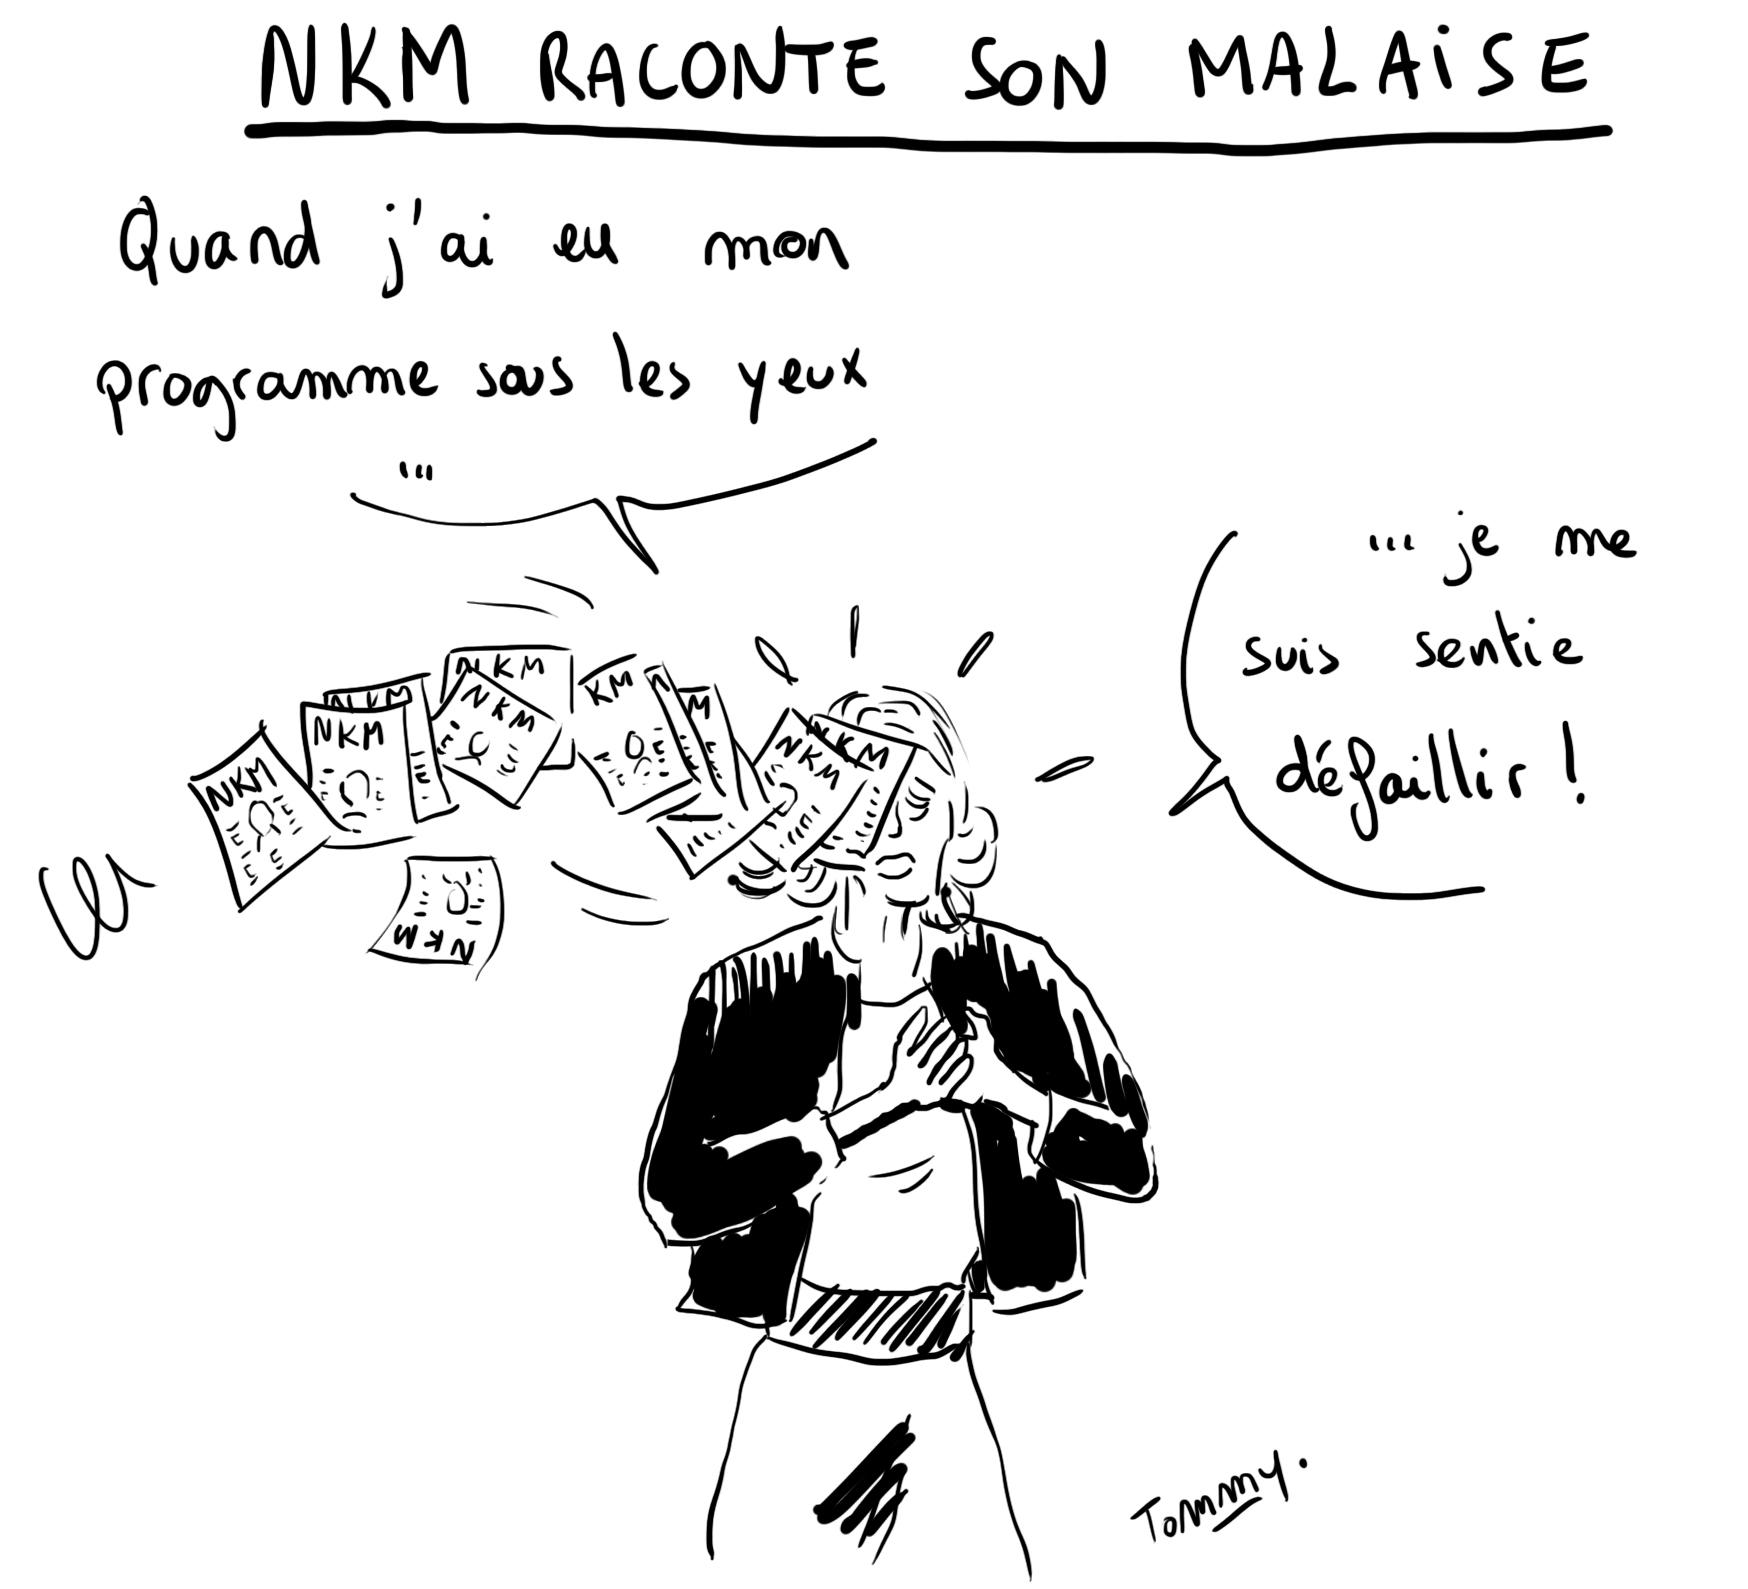 NKM - le malaise